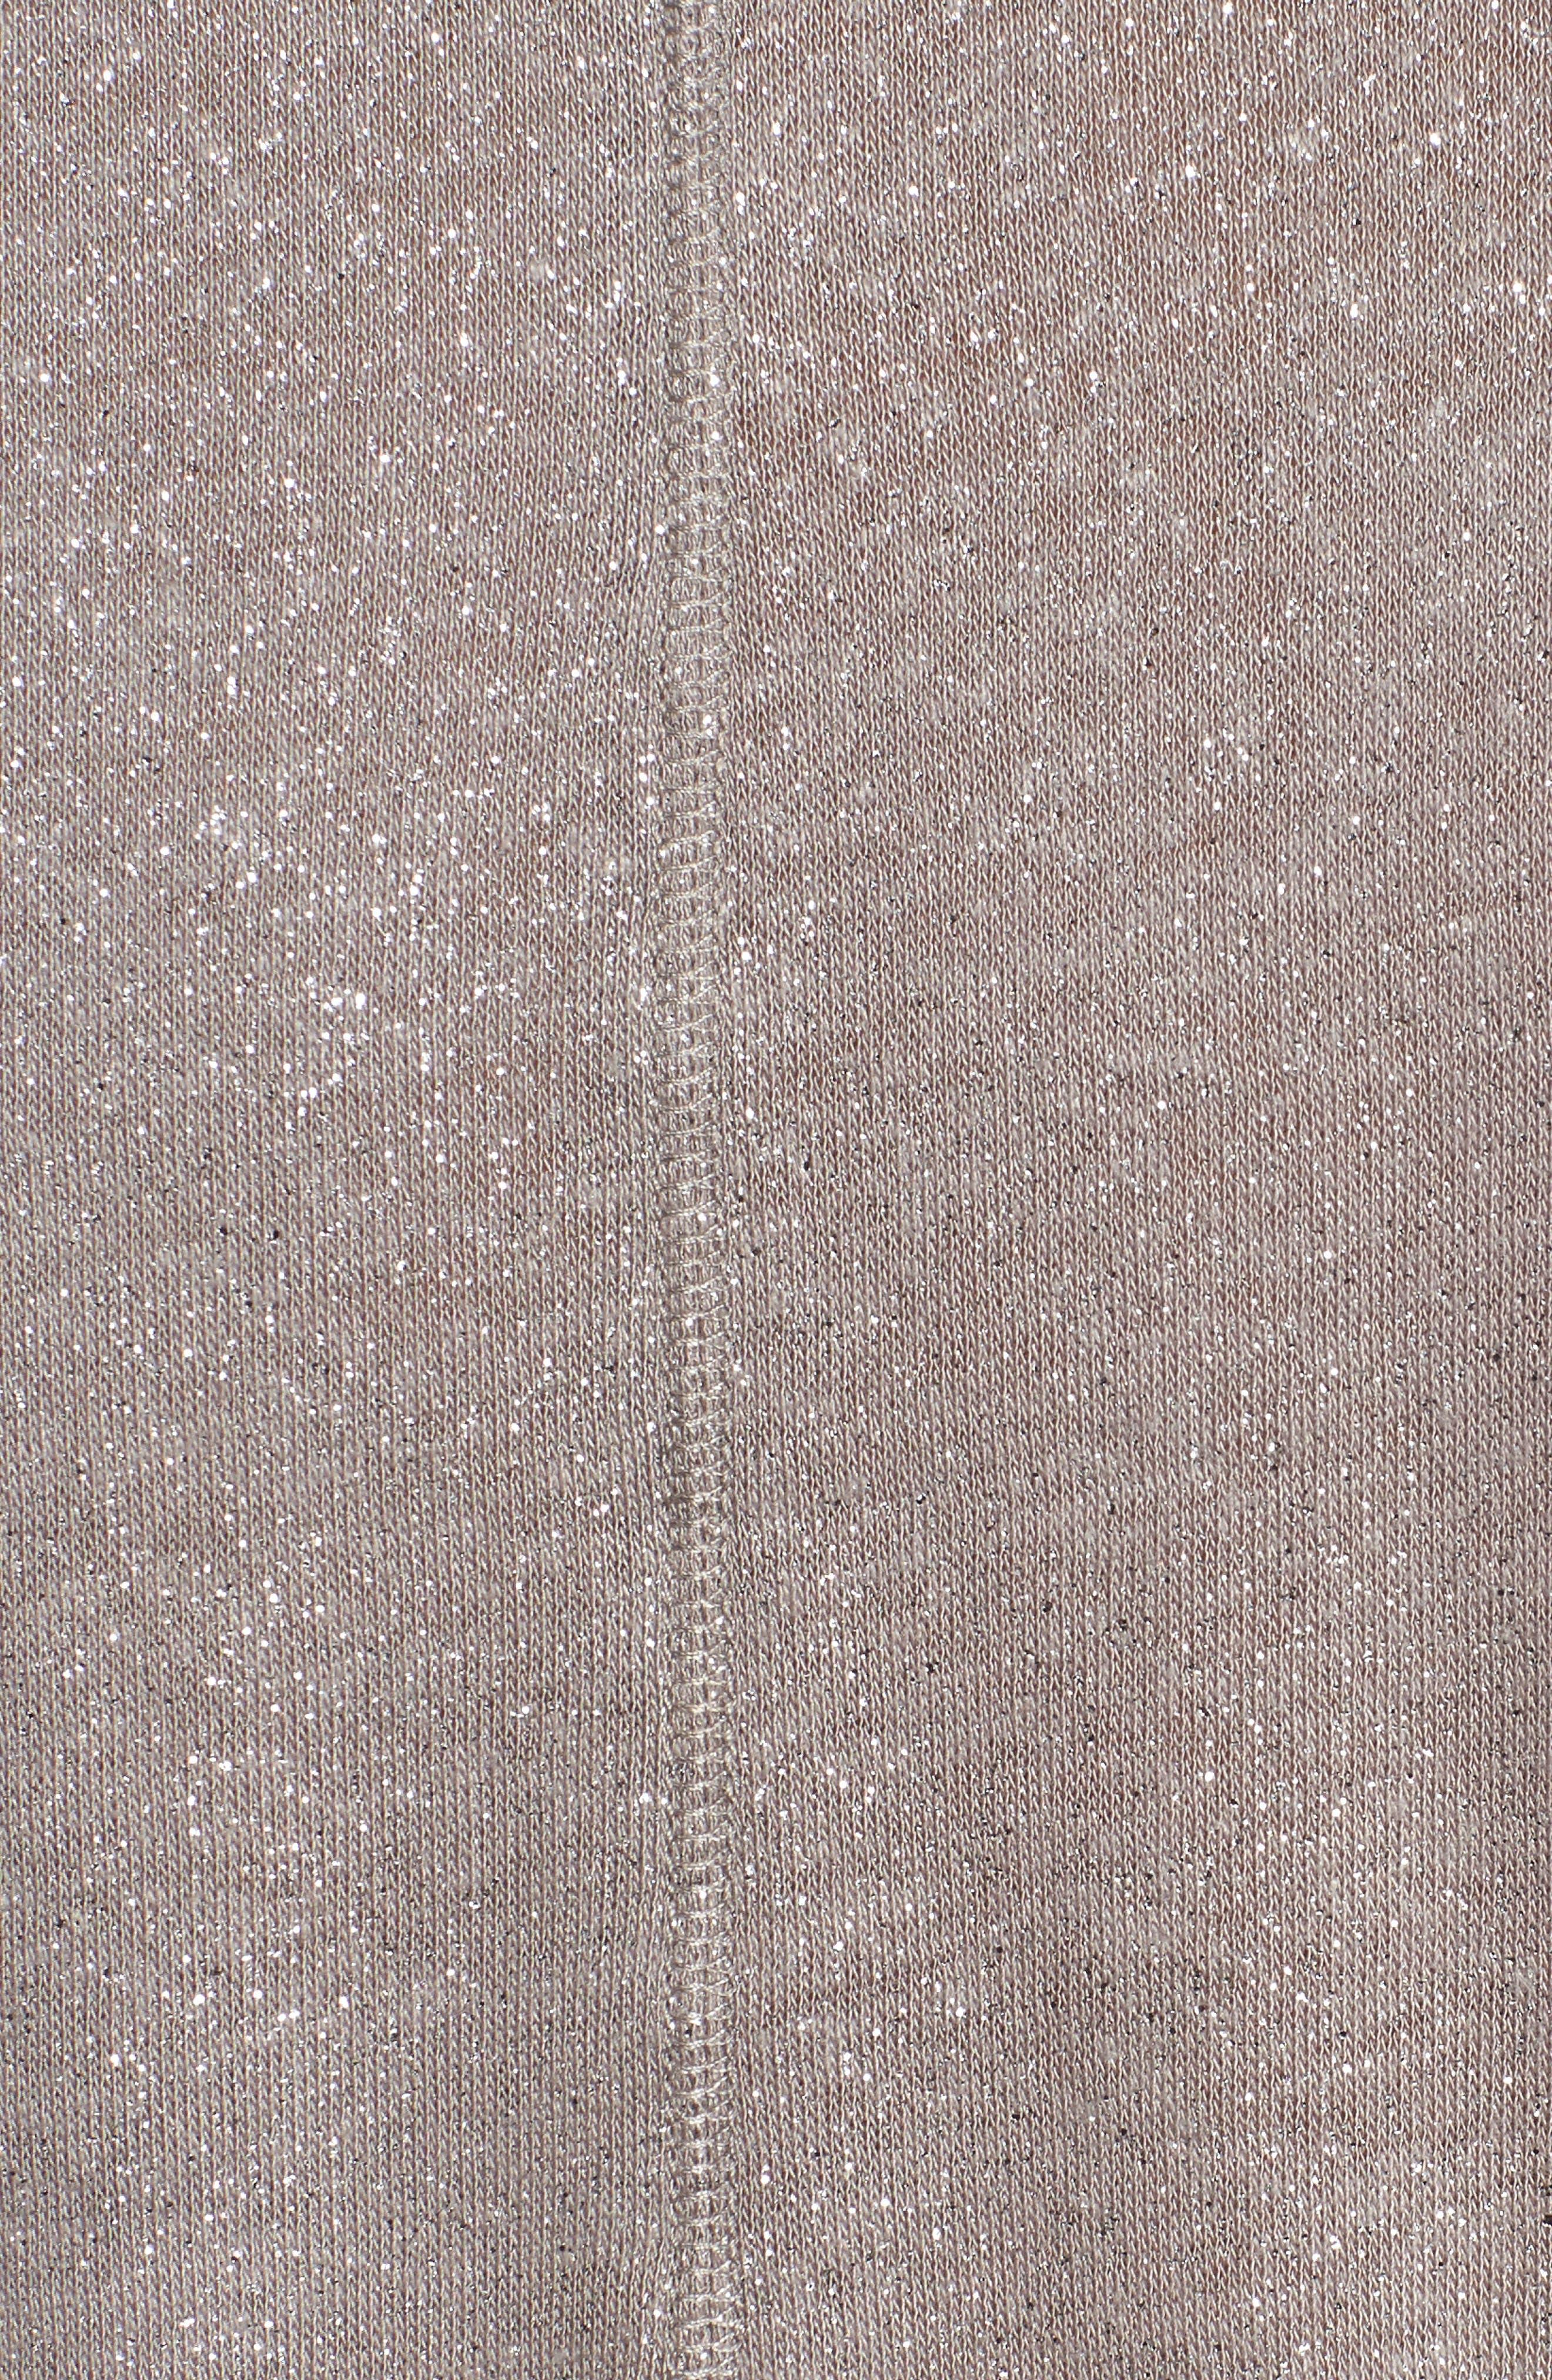 V-Neck Shimmer Tee,                             Alternate thumbnail 5, color,                             Grey Shimmer